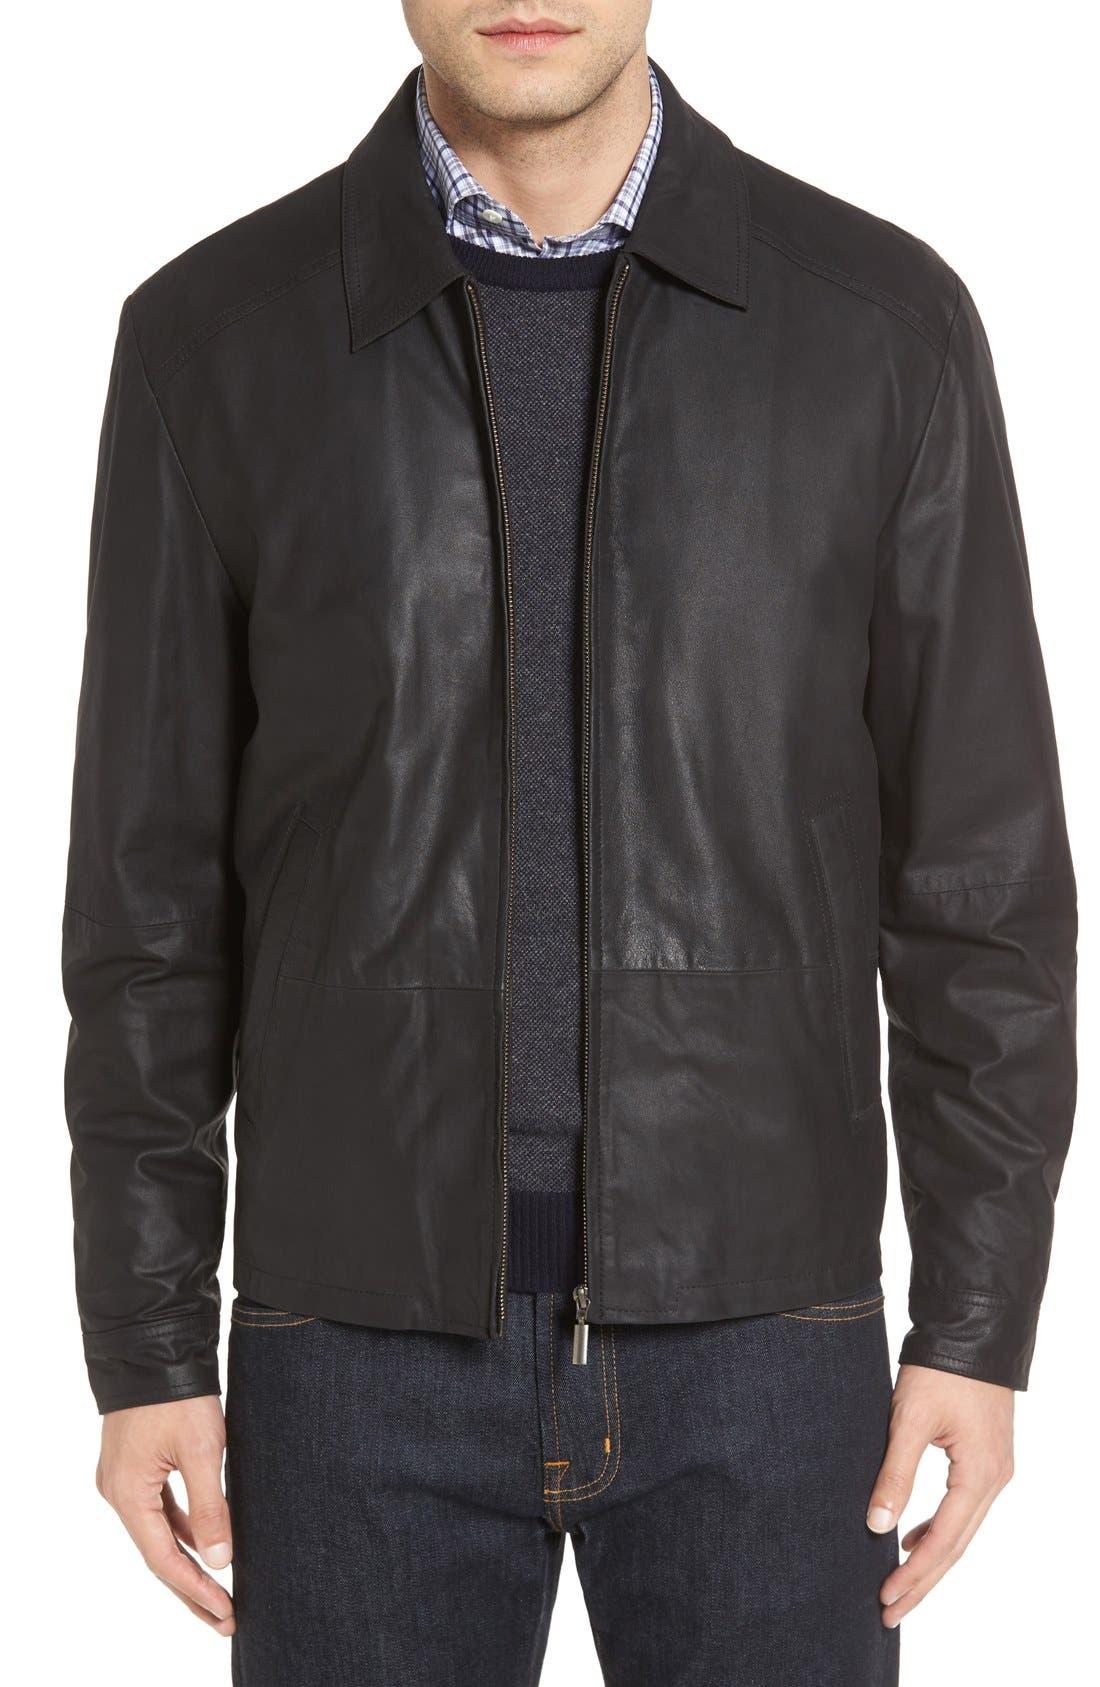 MissaniLe CollezioniLambskin Leather Jacket,                             Main thumbnail 1, color,                             Black